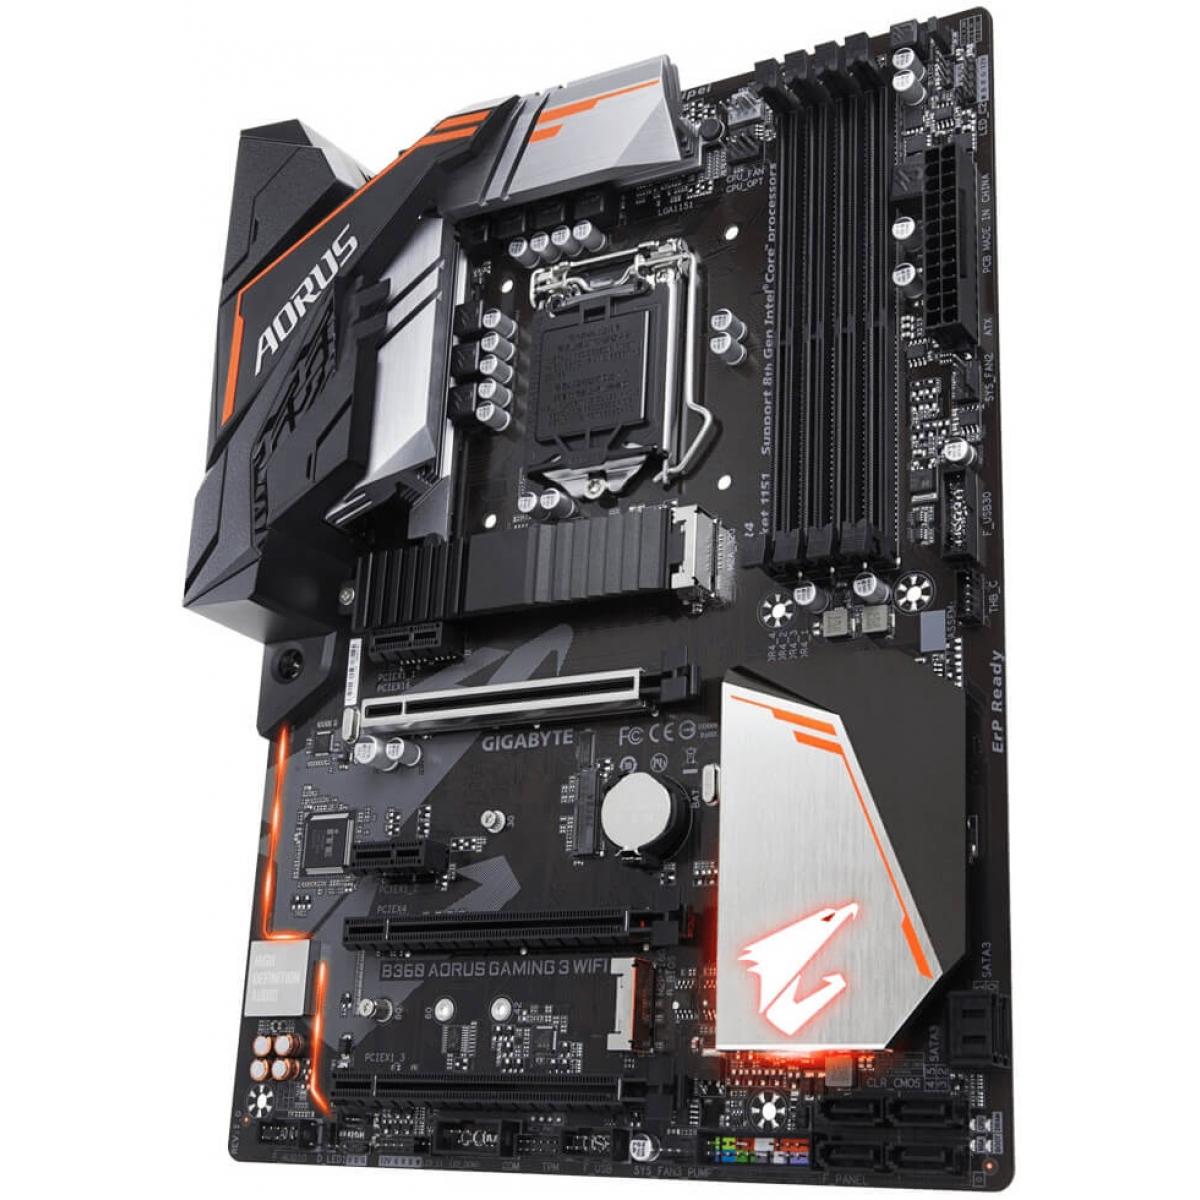 Placa Mãe Gigabyte B360 AORUS GAMING 3 WIFI, Chipset B360, Intel LGA 1151, ATX, DDR4